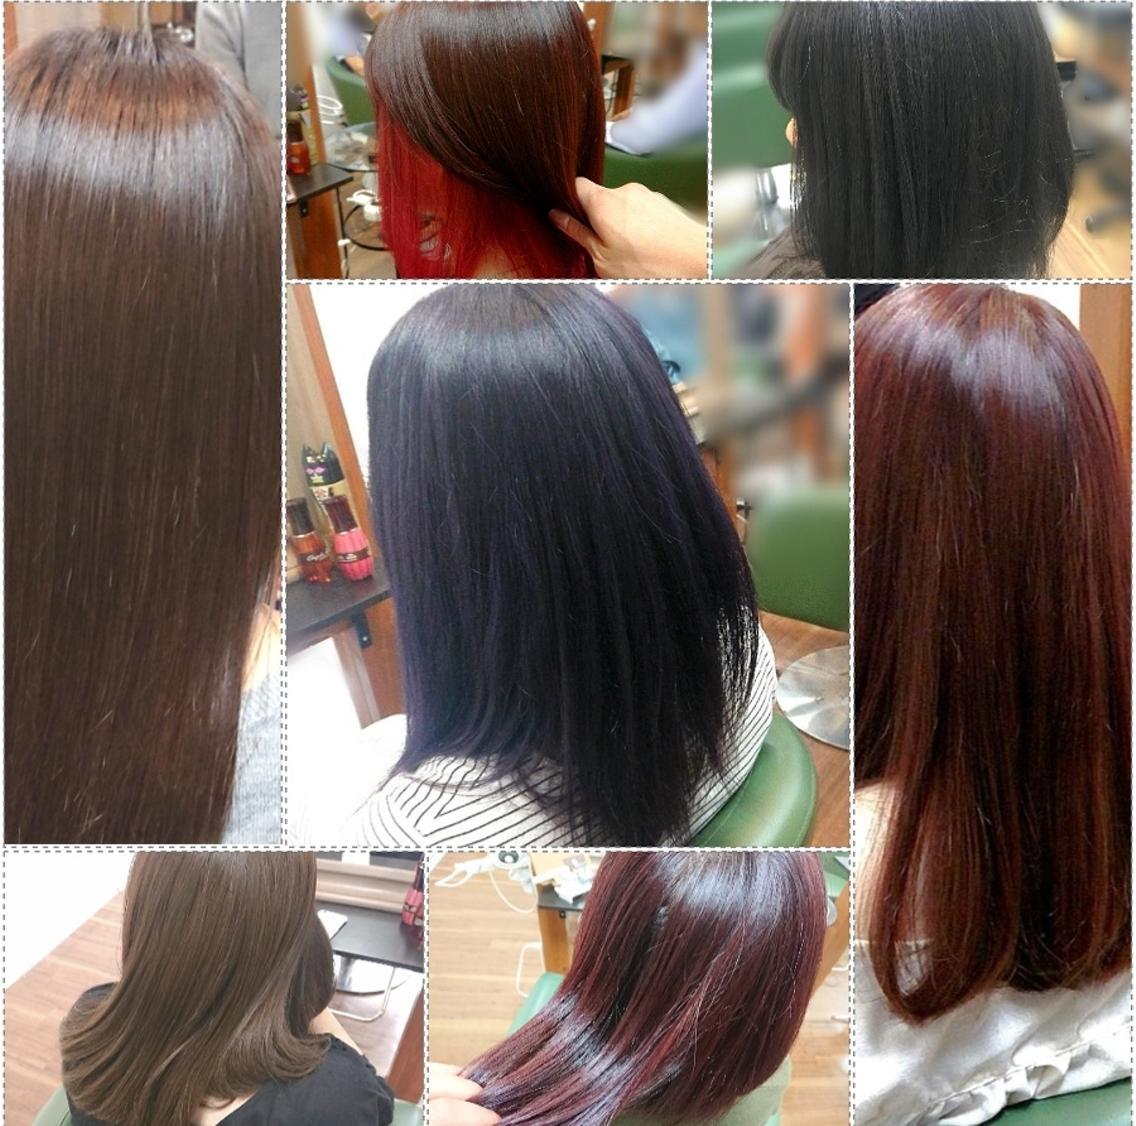 Hair Salon Valor 所属・渡辺康行の掲載